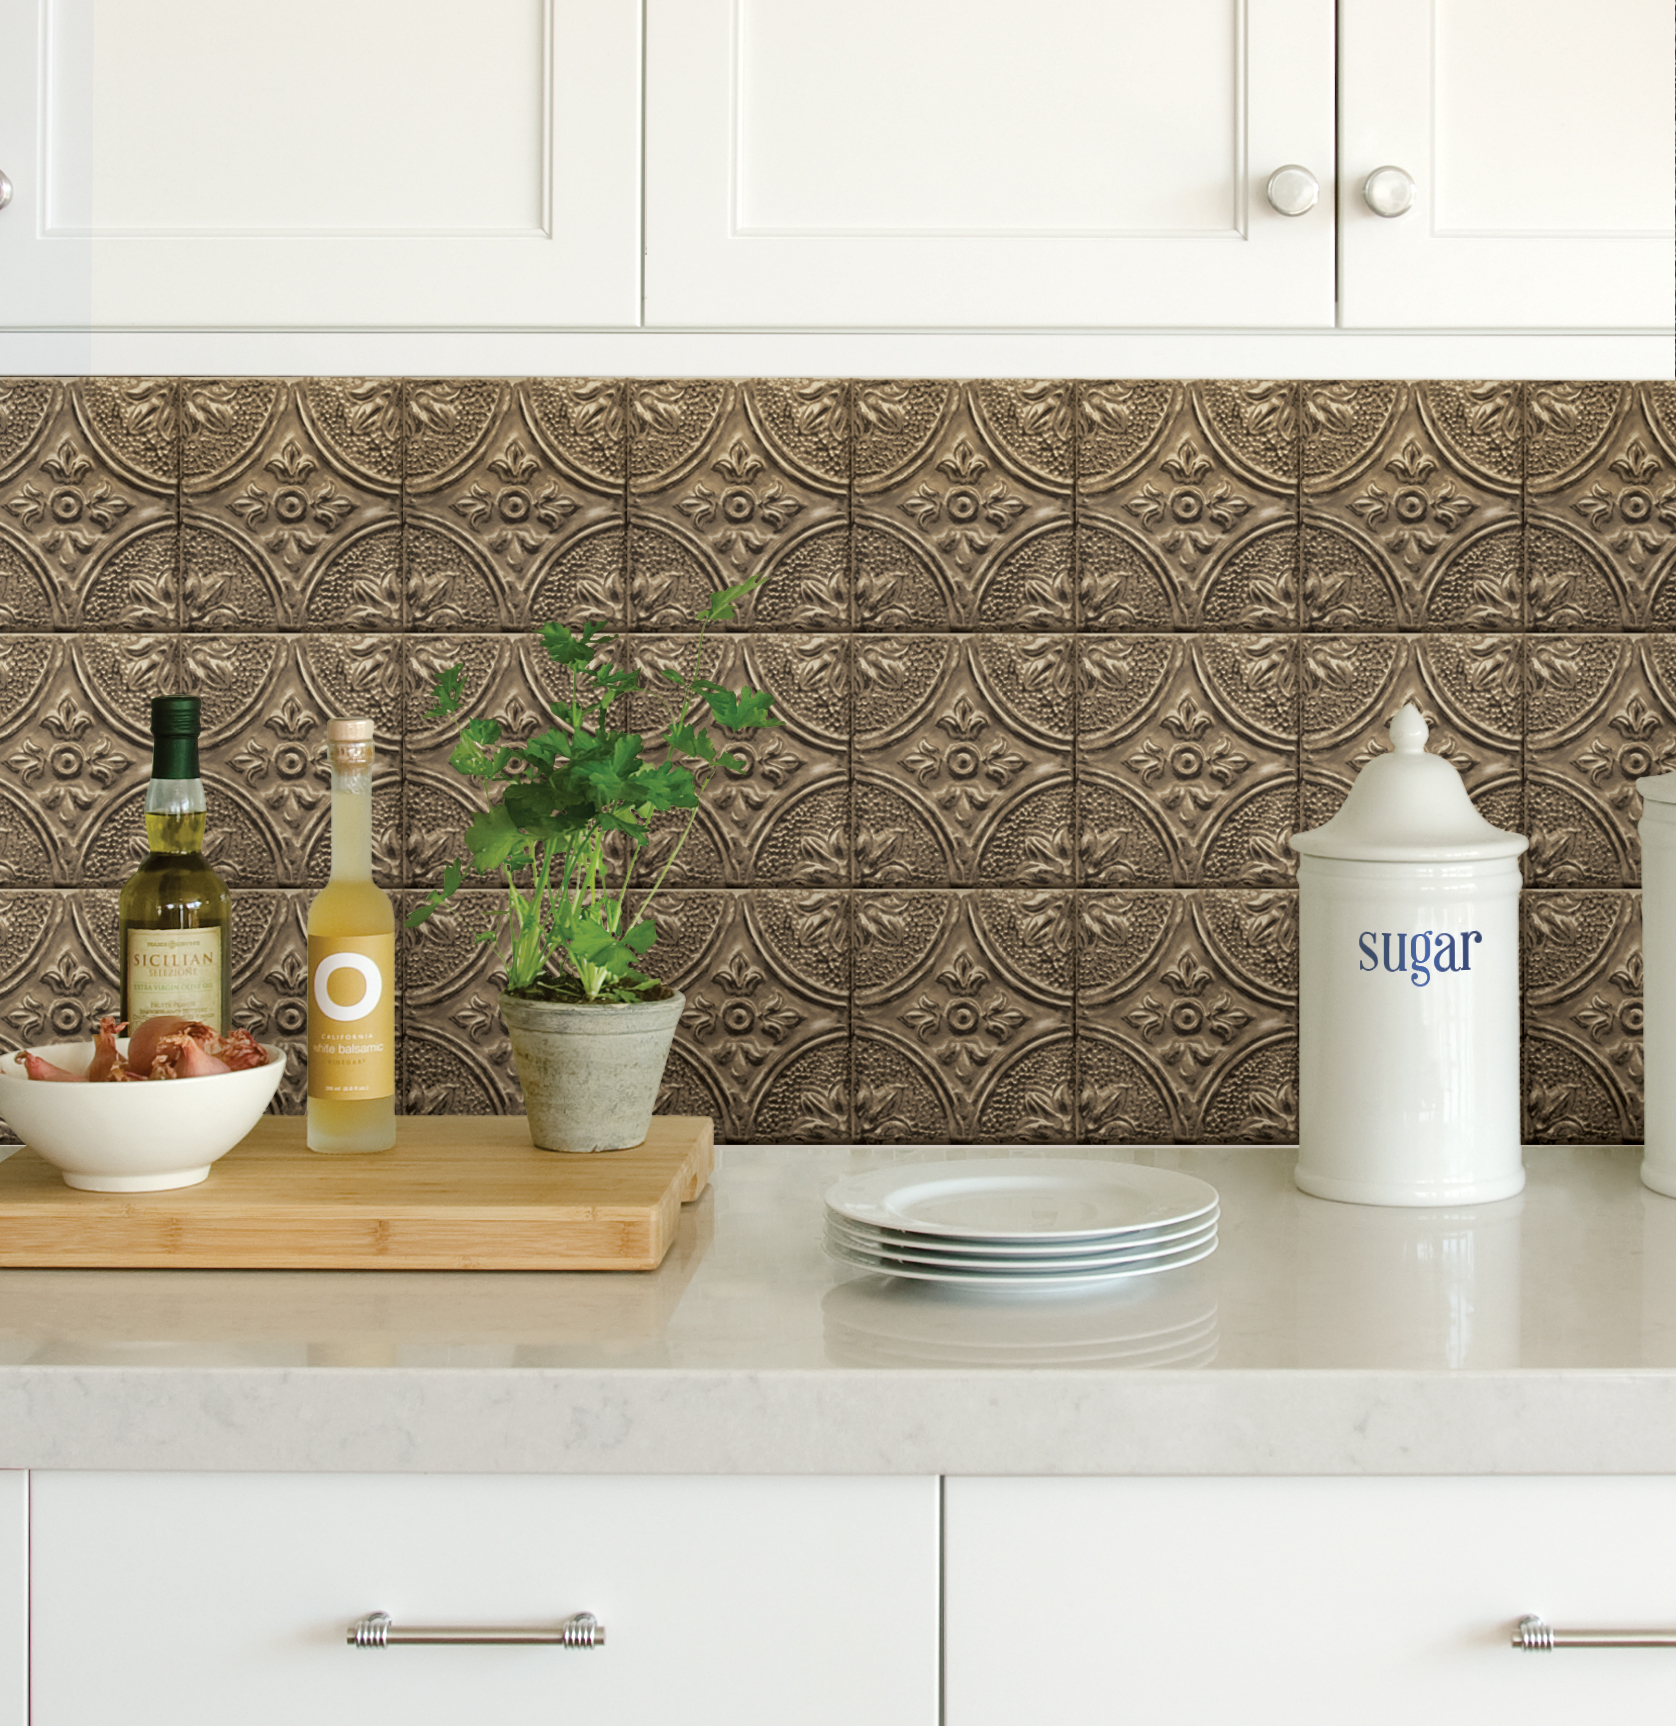 Self Adhesive Backsplashes Pictures Ideas From Hgtv: InHome Restored Tile Bronze Peel & Stick Backsplash Tiles